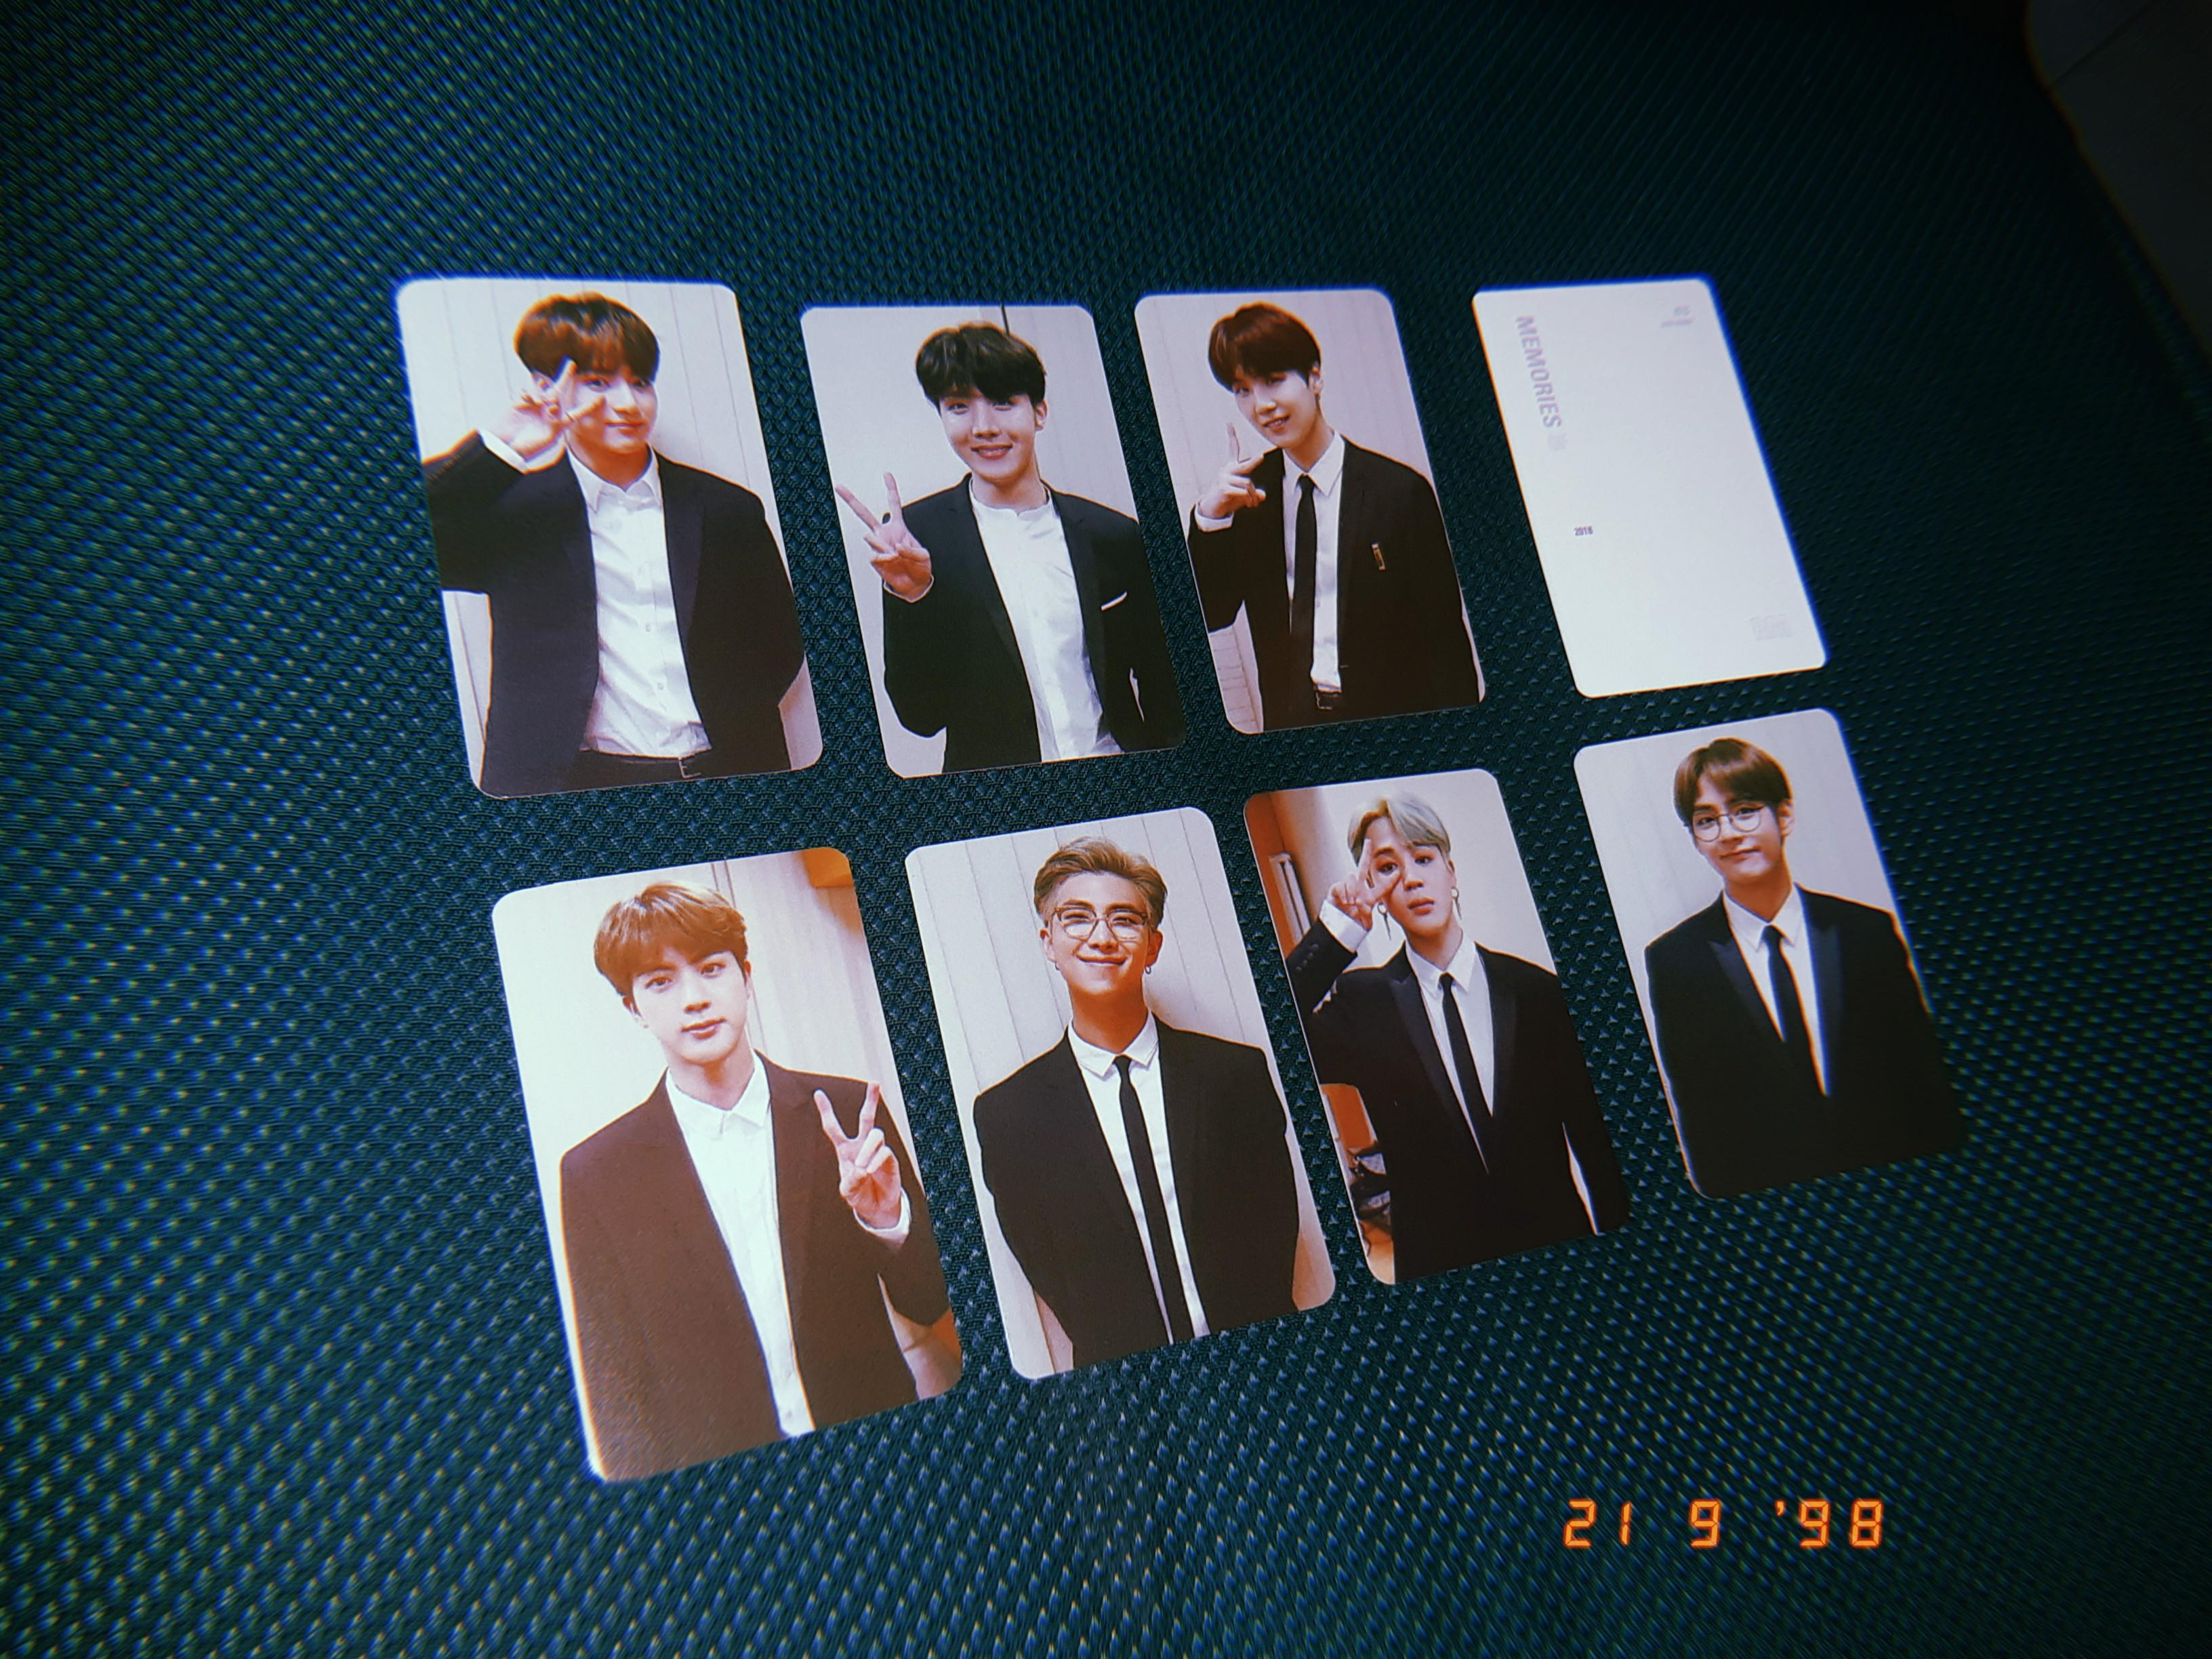 BTS MEMORIES 2018 DVD PHOTOCARDS